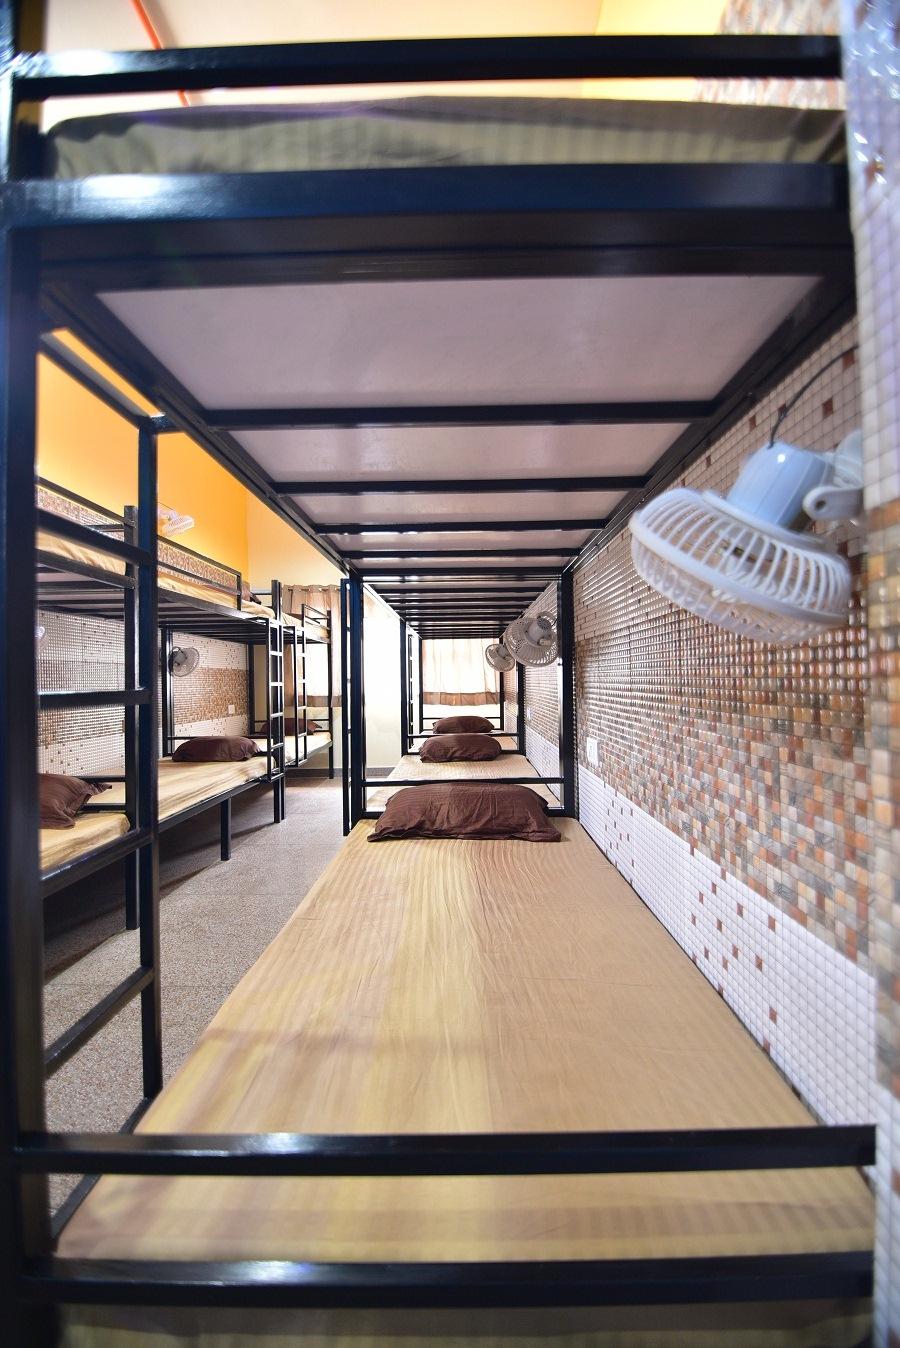 Pillow Dormitory